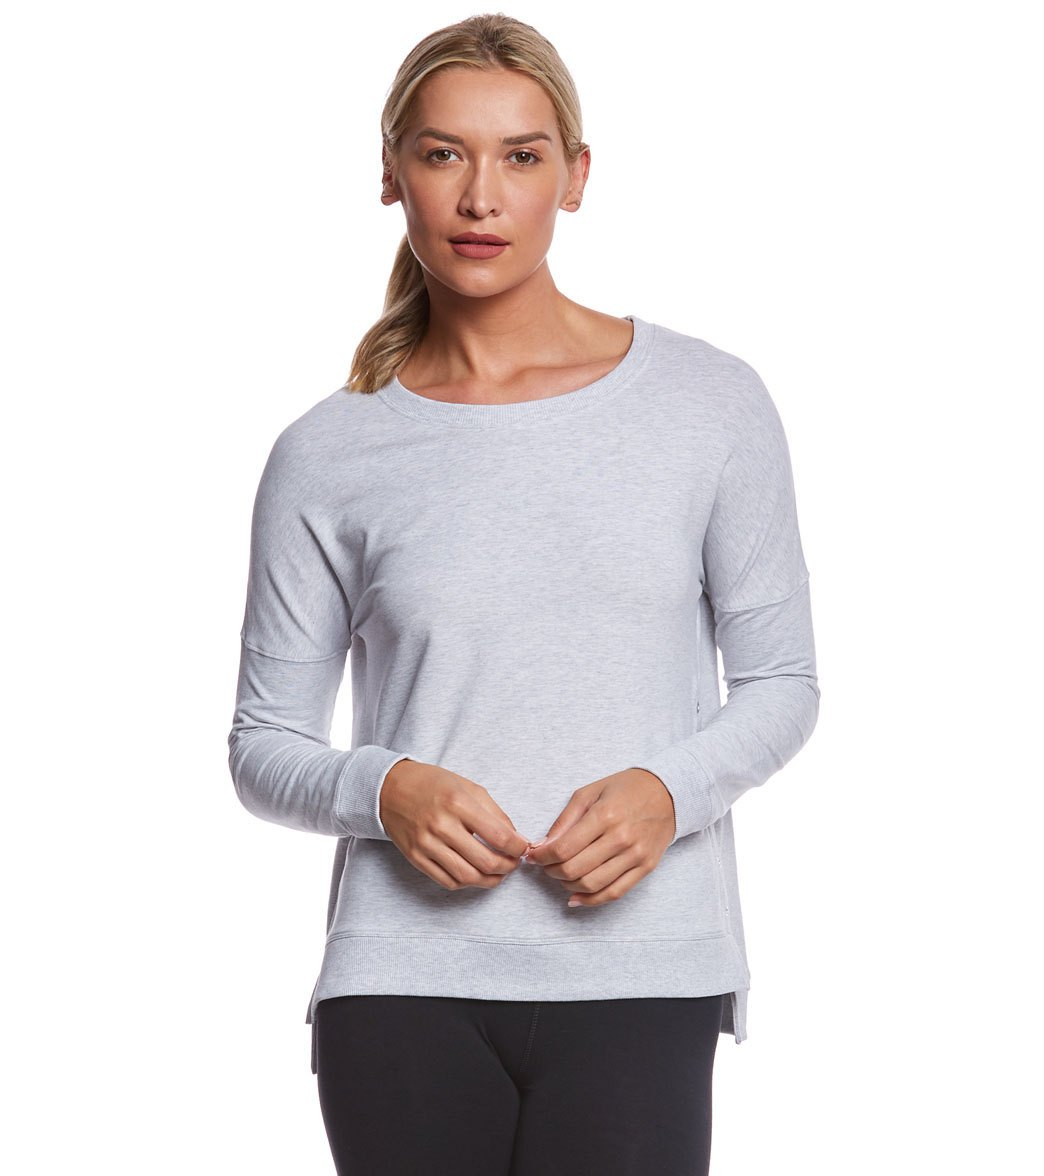 75812065972738 Tasc Performance Women's Riverwalk Sweatshirt at SwimOutlet.com - Free  Shipping